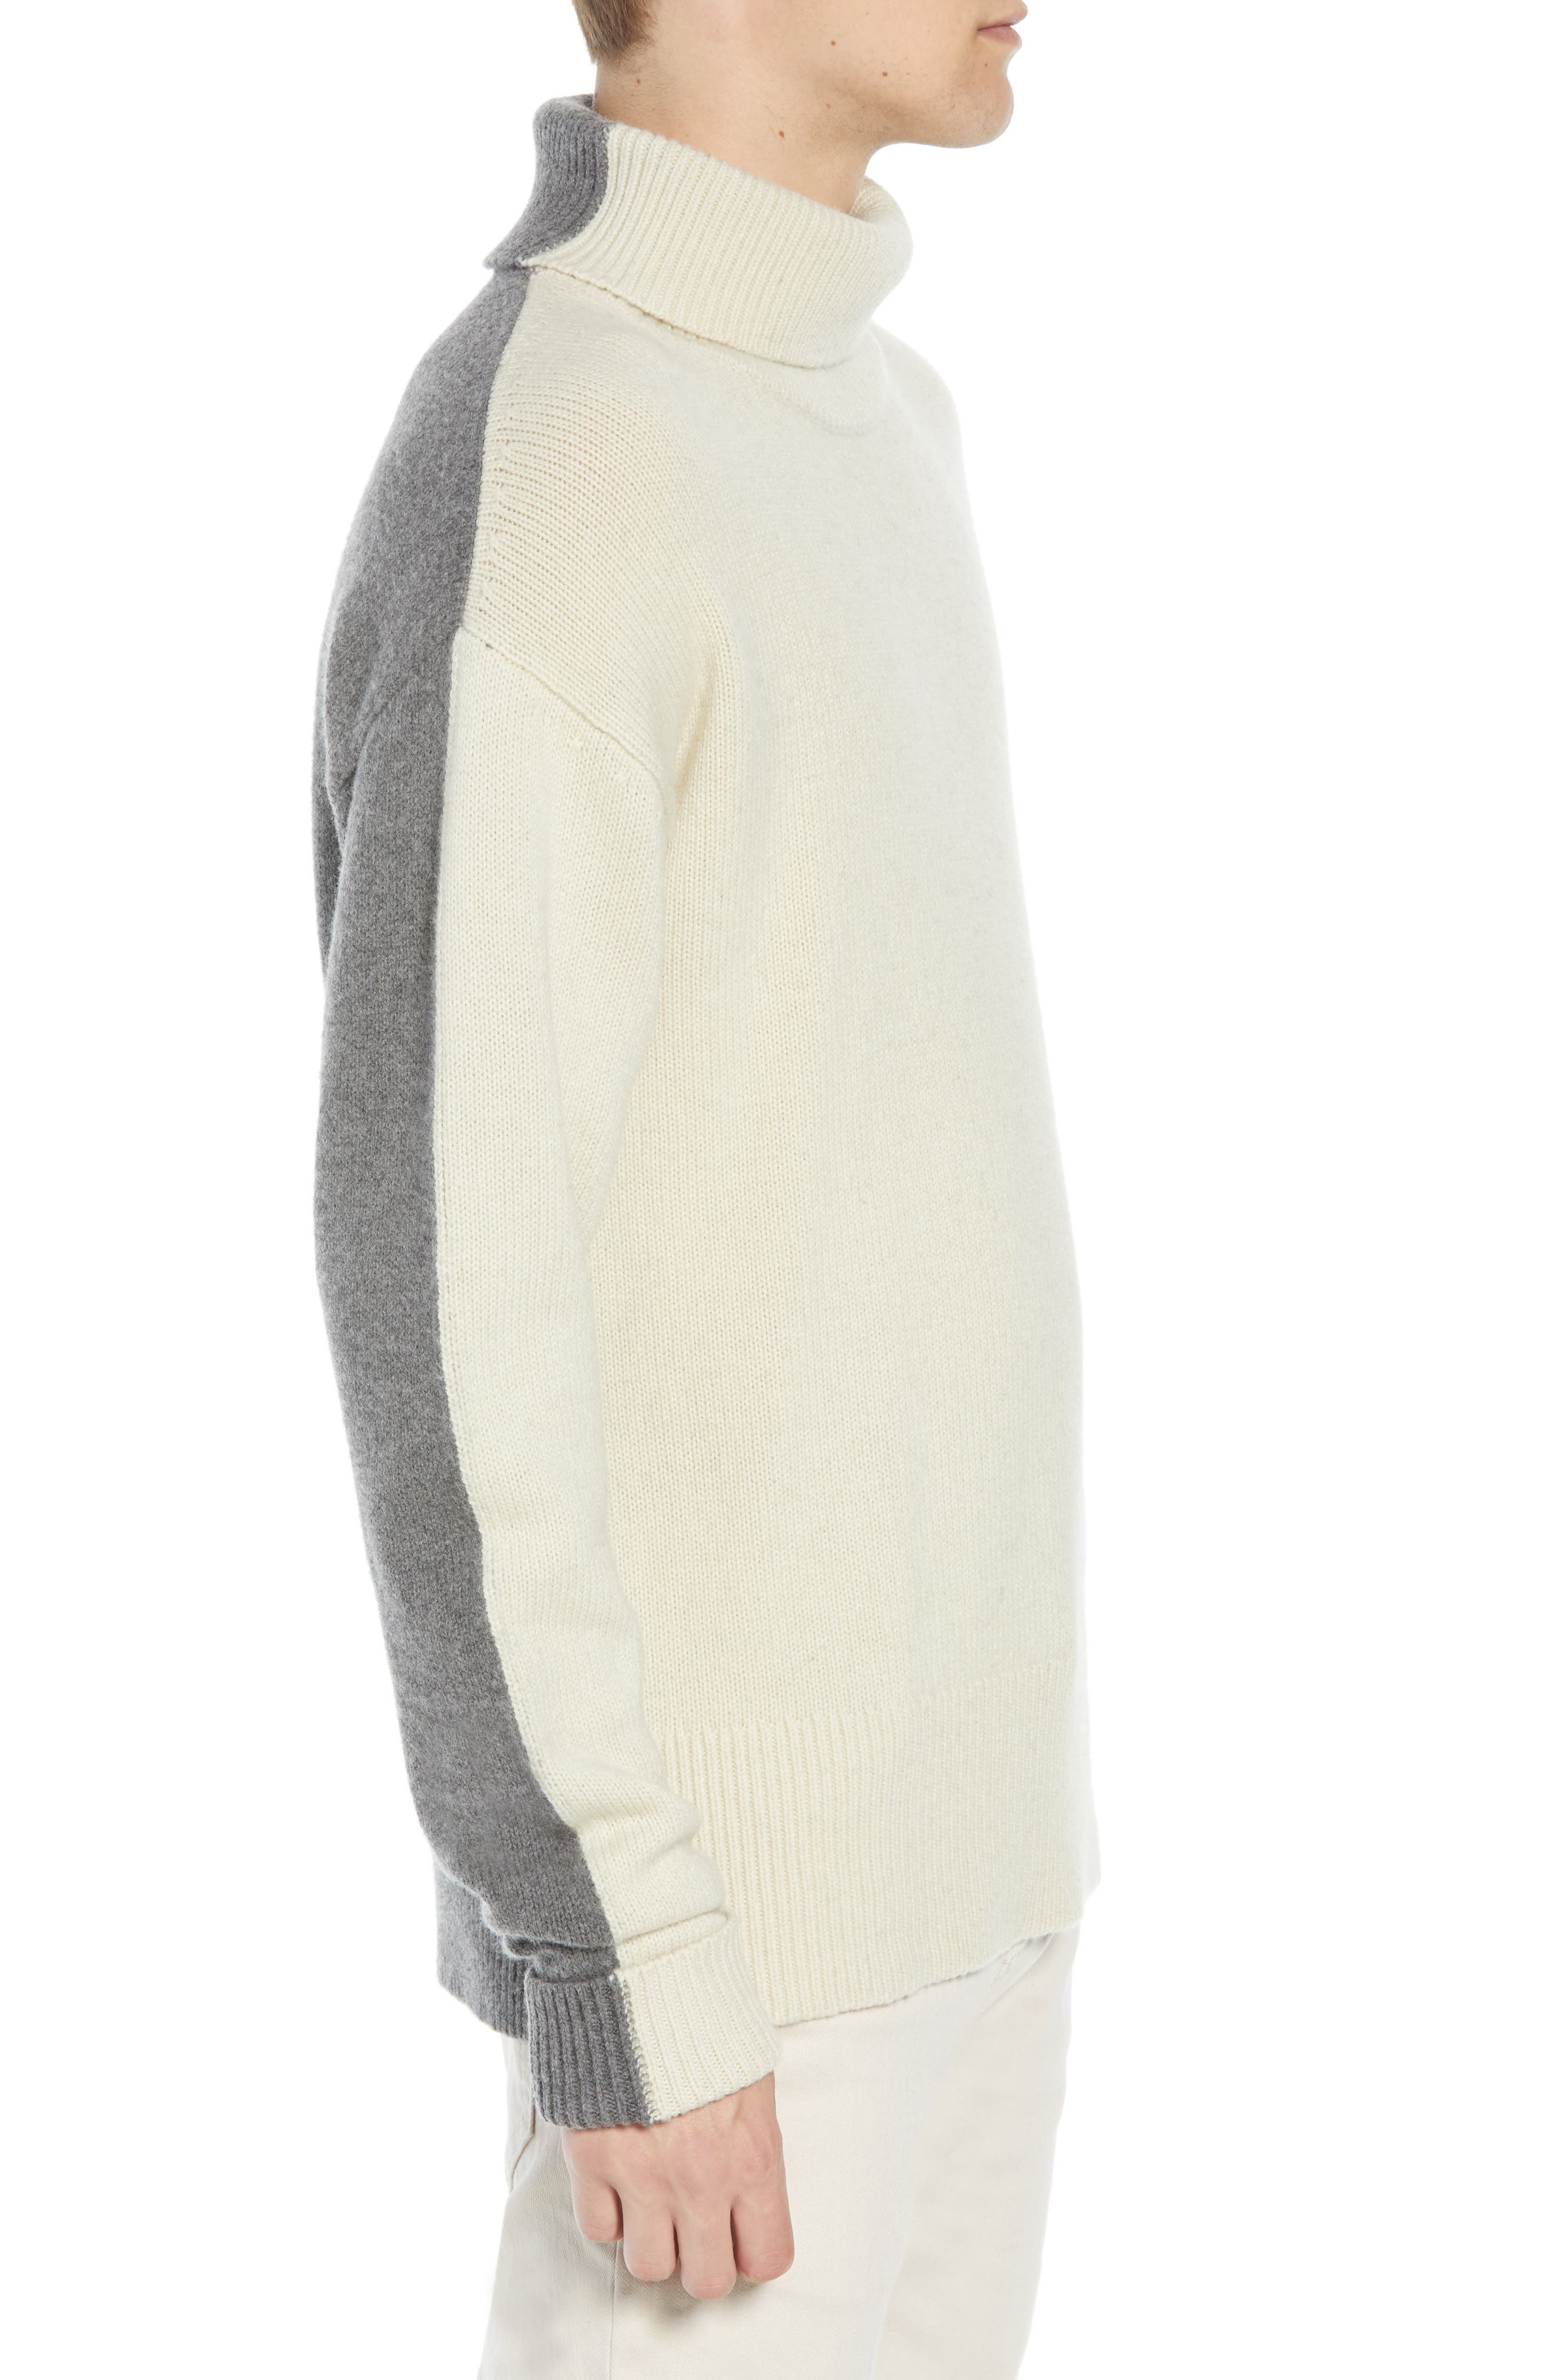 Colorblock Turtleneck Sweater,                             Alternate thumbnail 3, color,                             FOG MID GREY MELANGE